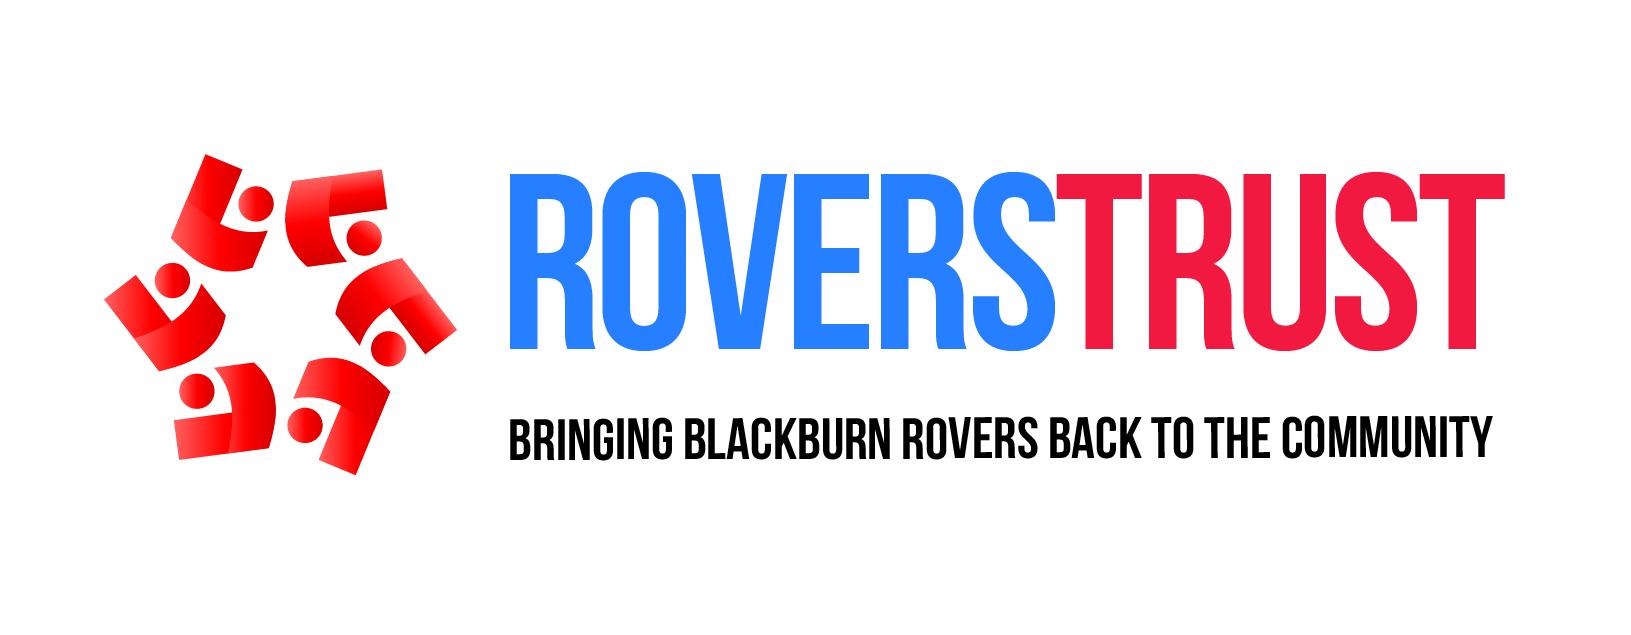 Rovers Trust Logo Draft 3 011 E1366815066547